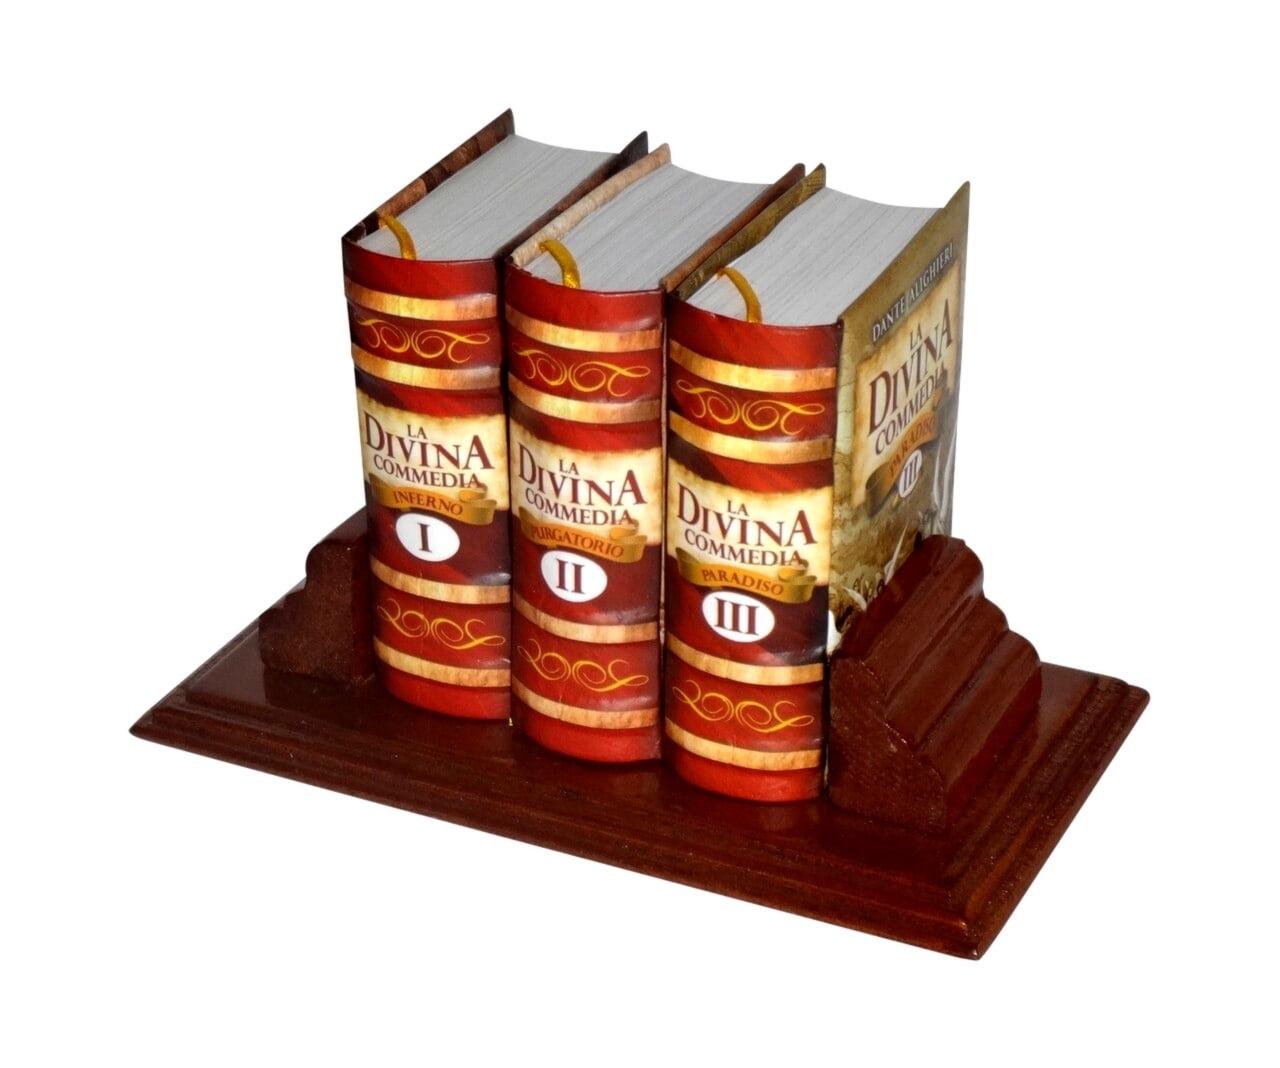 Divina_commedia-miniature-book-libro